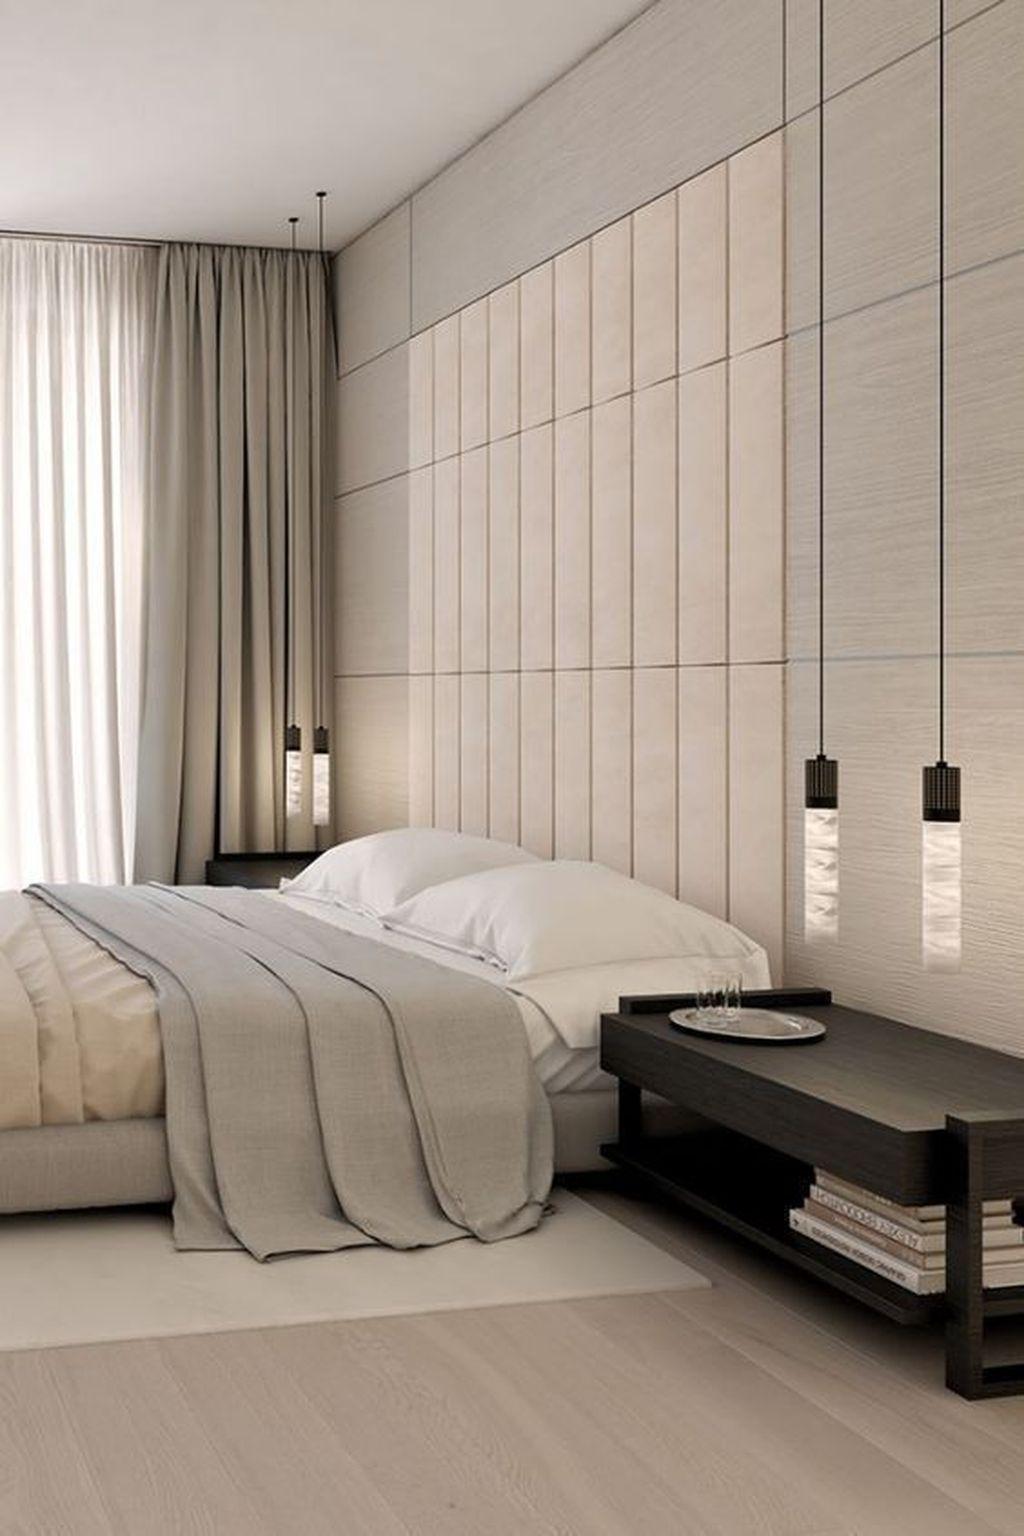 34 Popular Minimalist Master Bedroom Design Ideas - Home ...